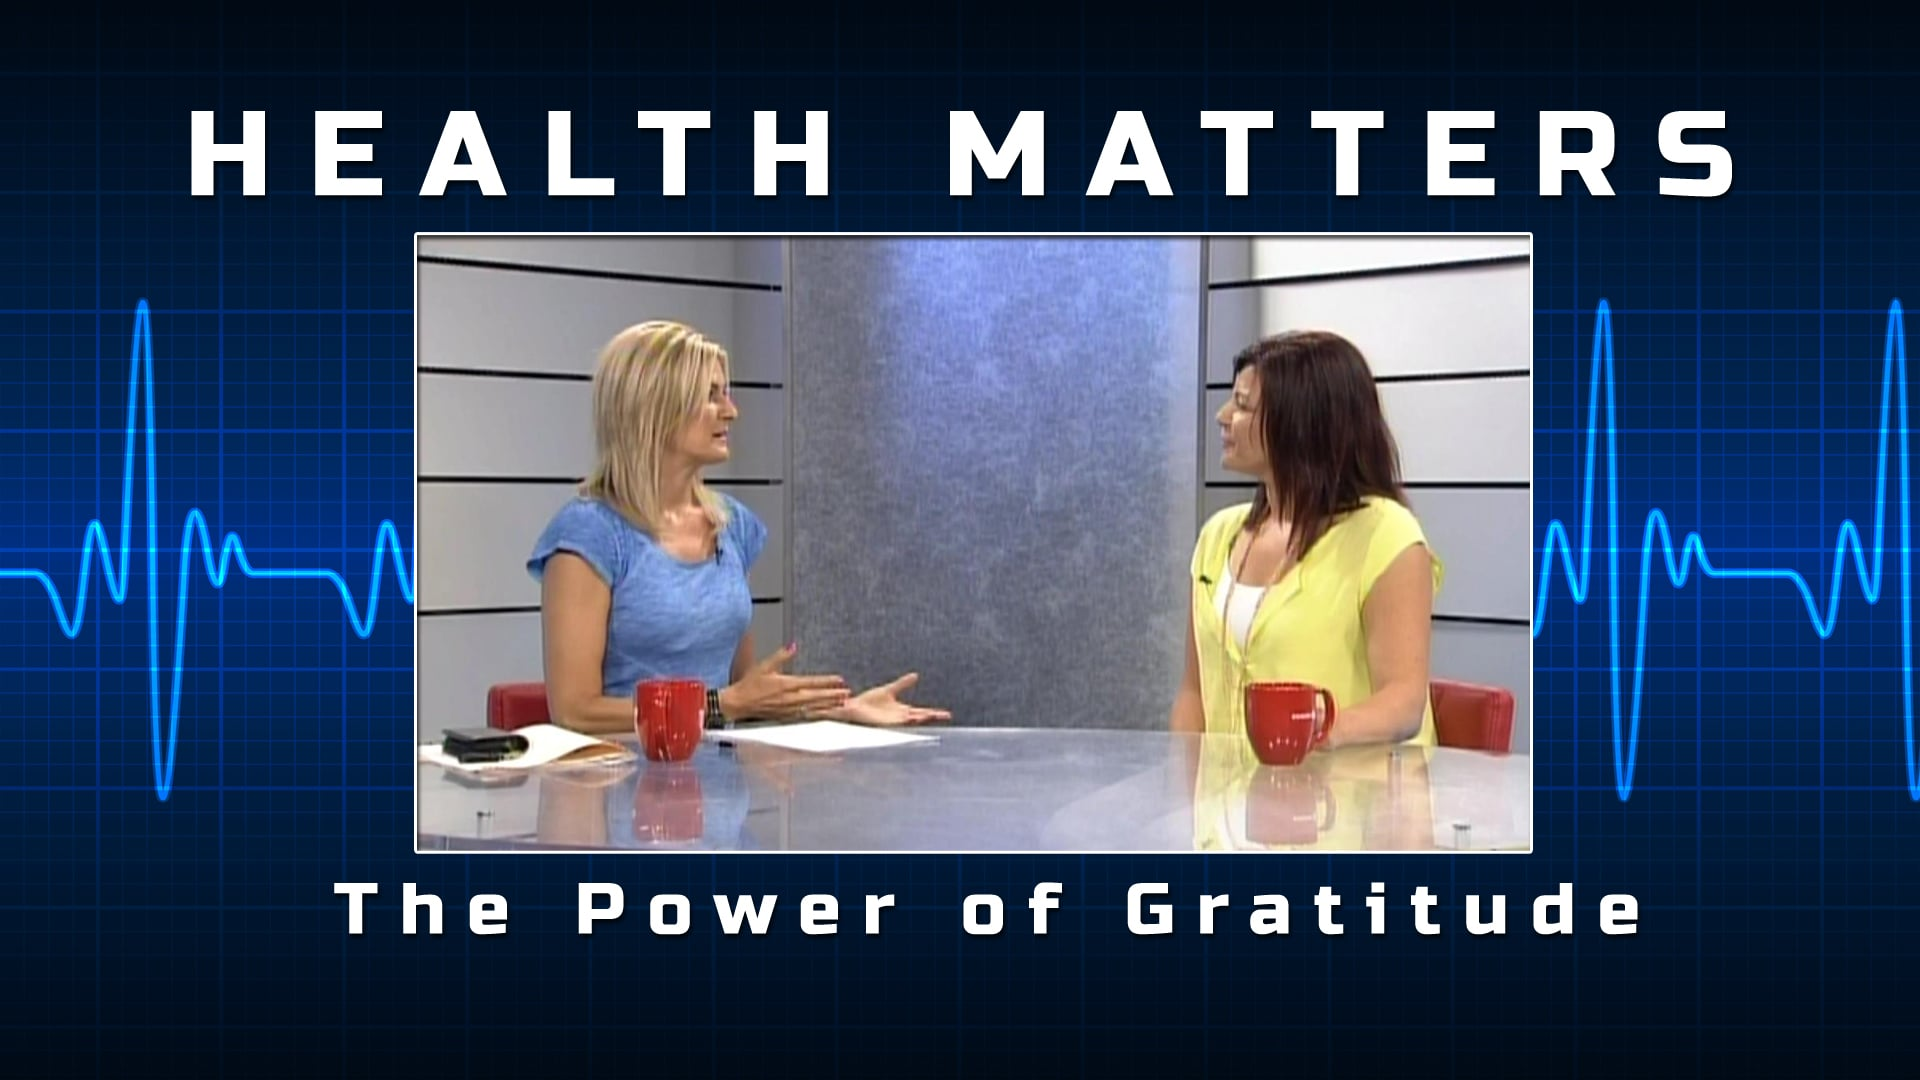 Health Matters – Gratitude